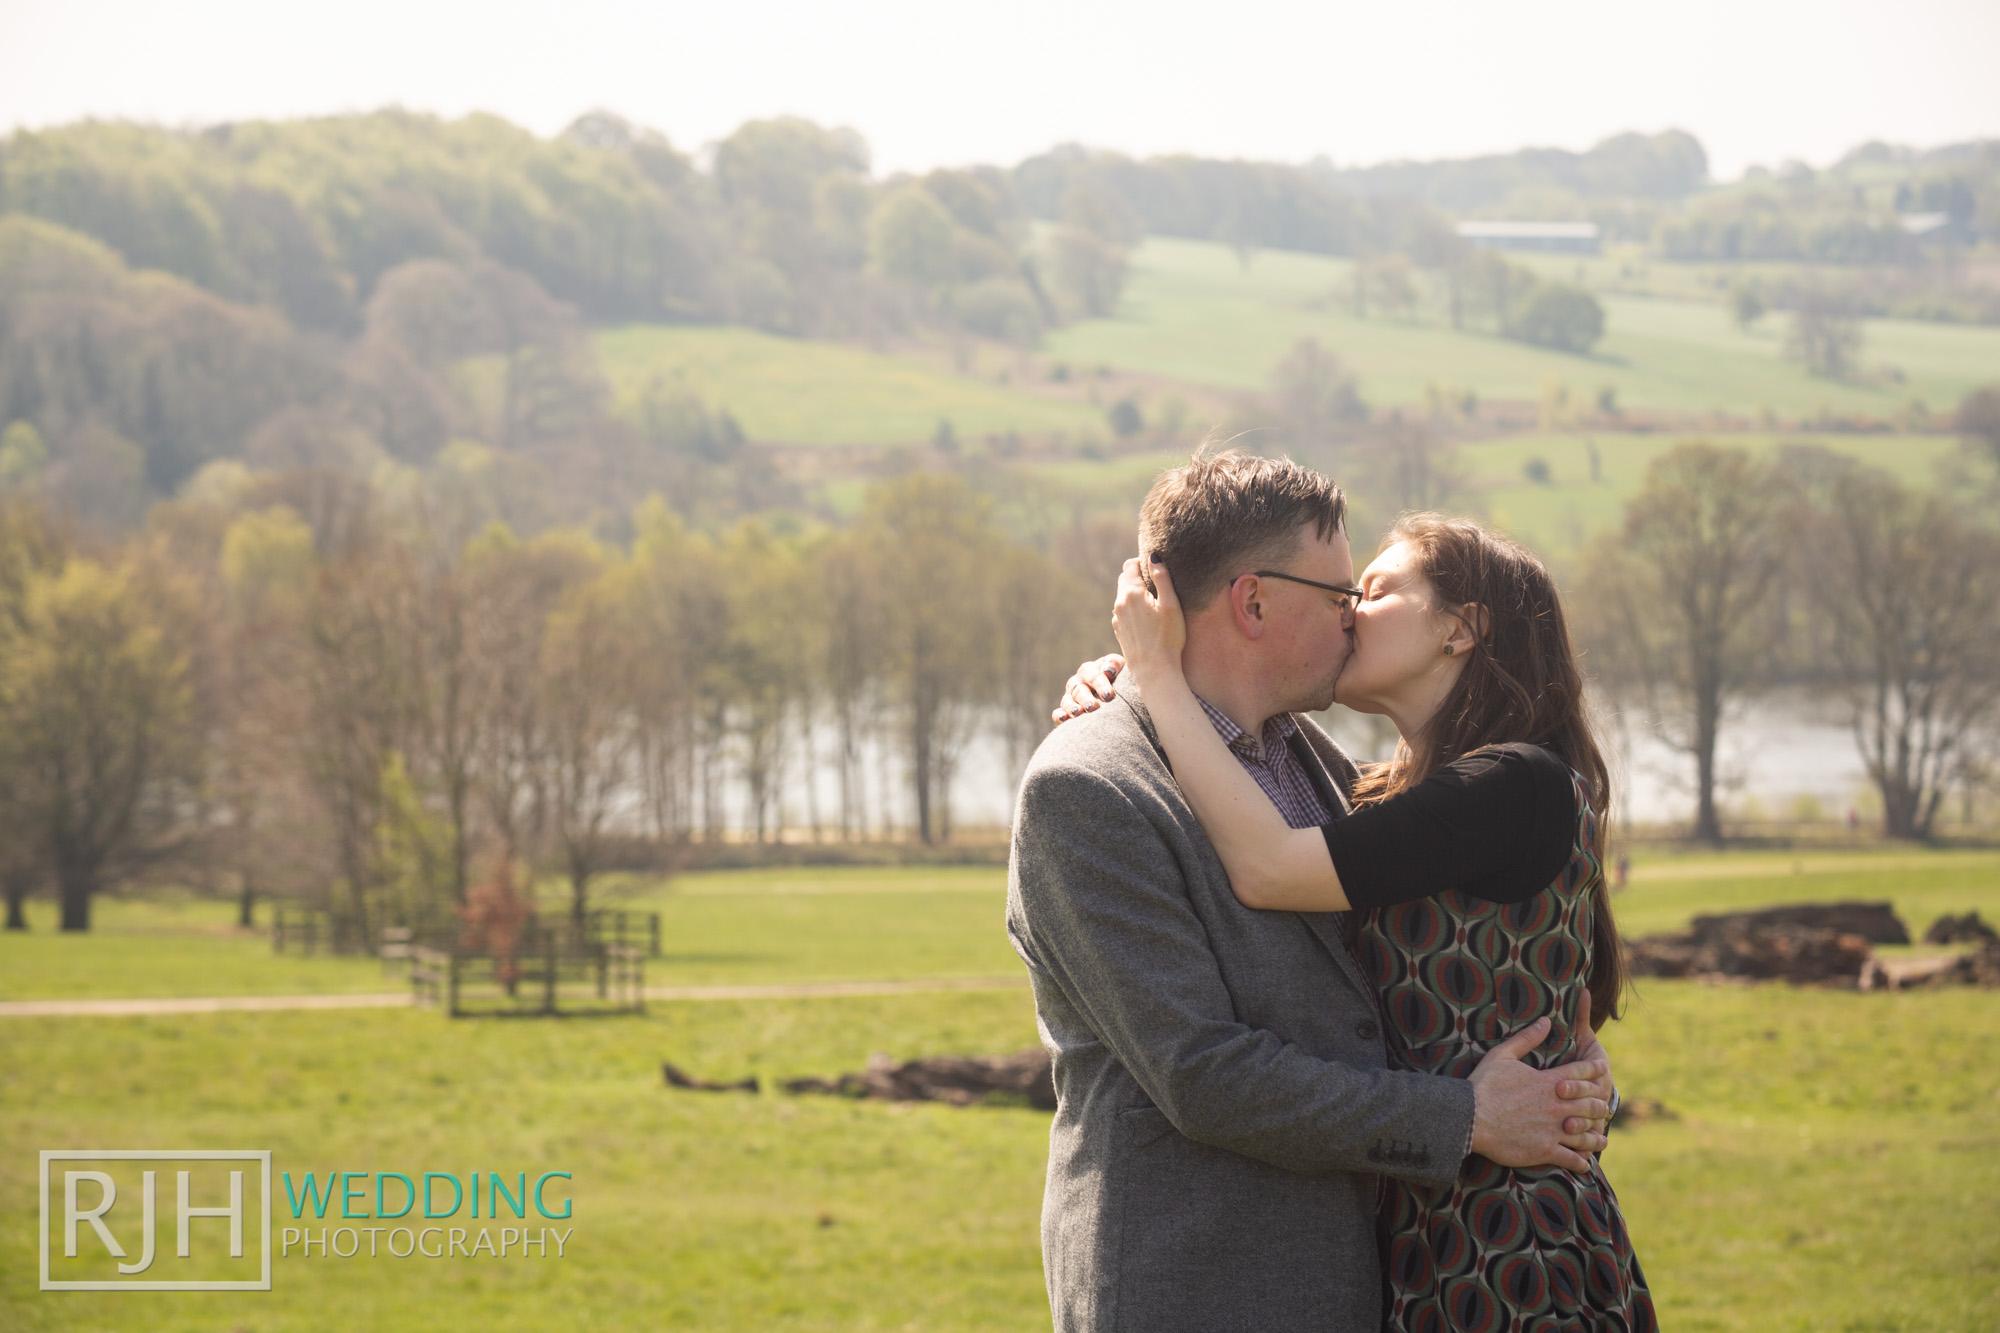 Pre-wedding photography - Richard & Rachel_038_3C2A8359.jpg